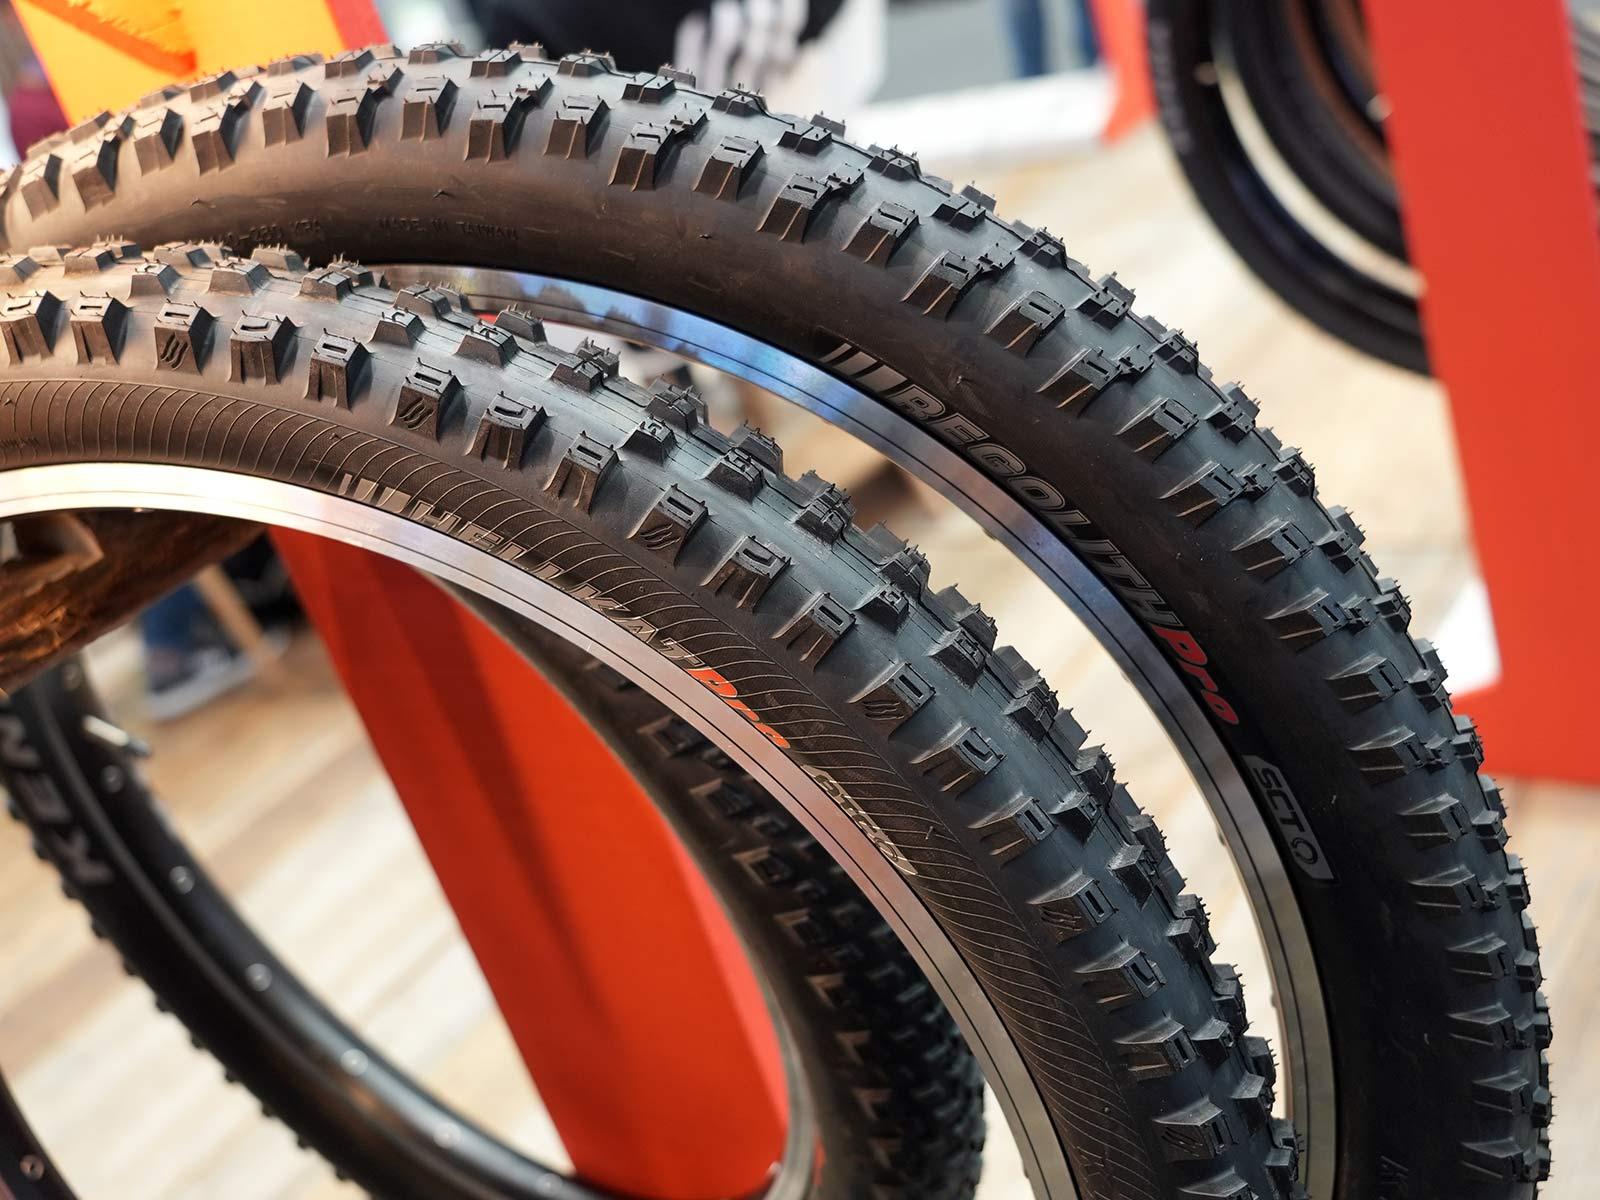 kenda hellkat and regolith mountain bike tire closeups